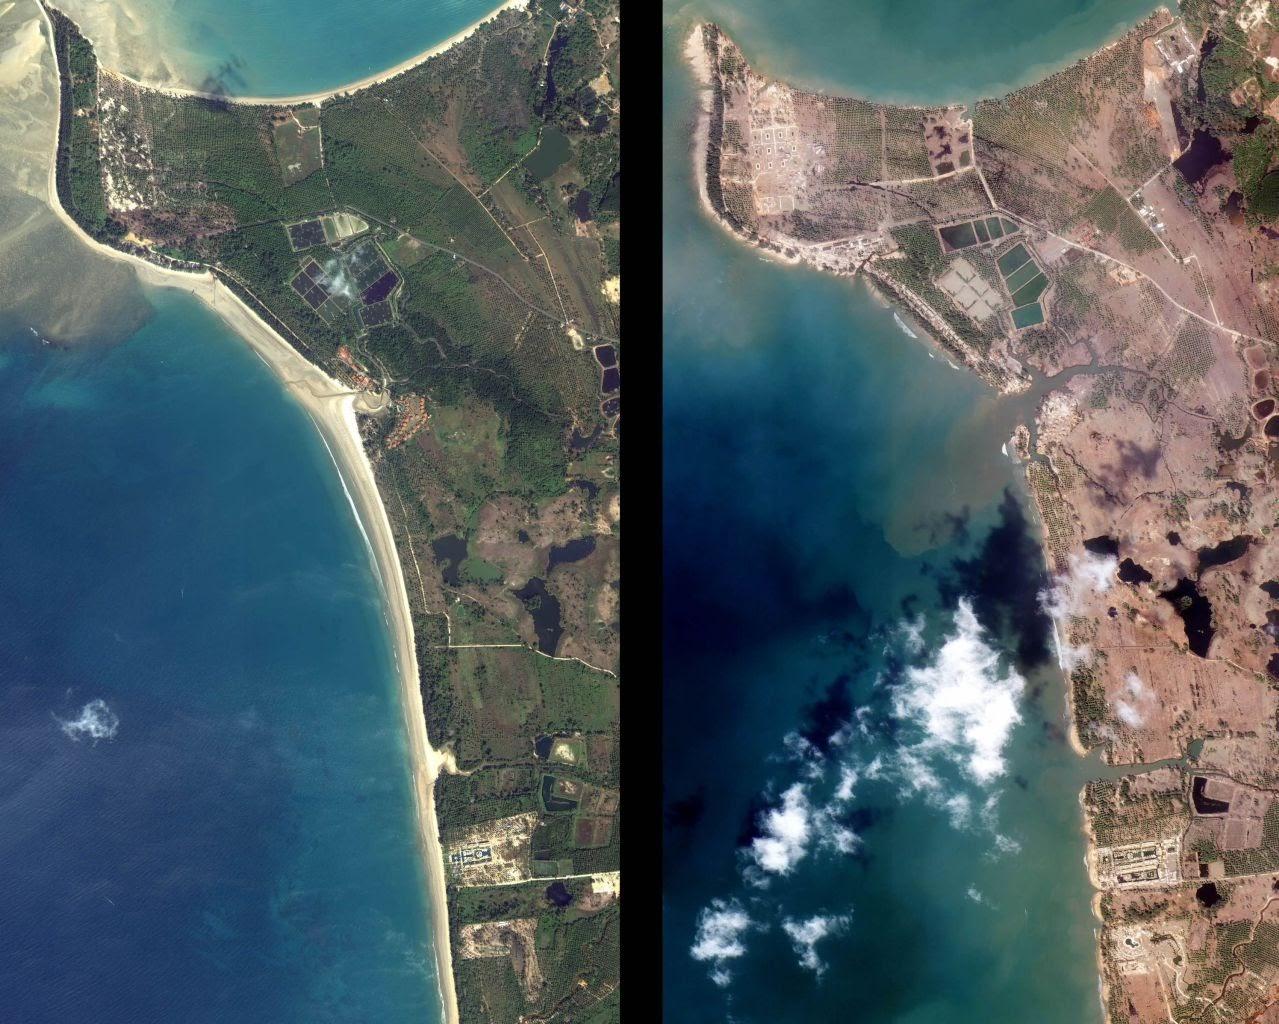 imagen del tsunami: